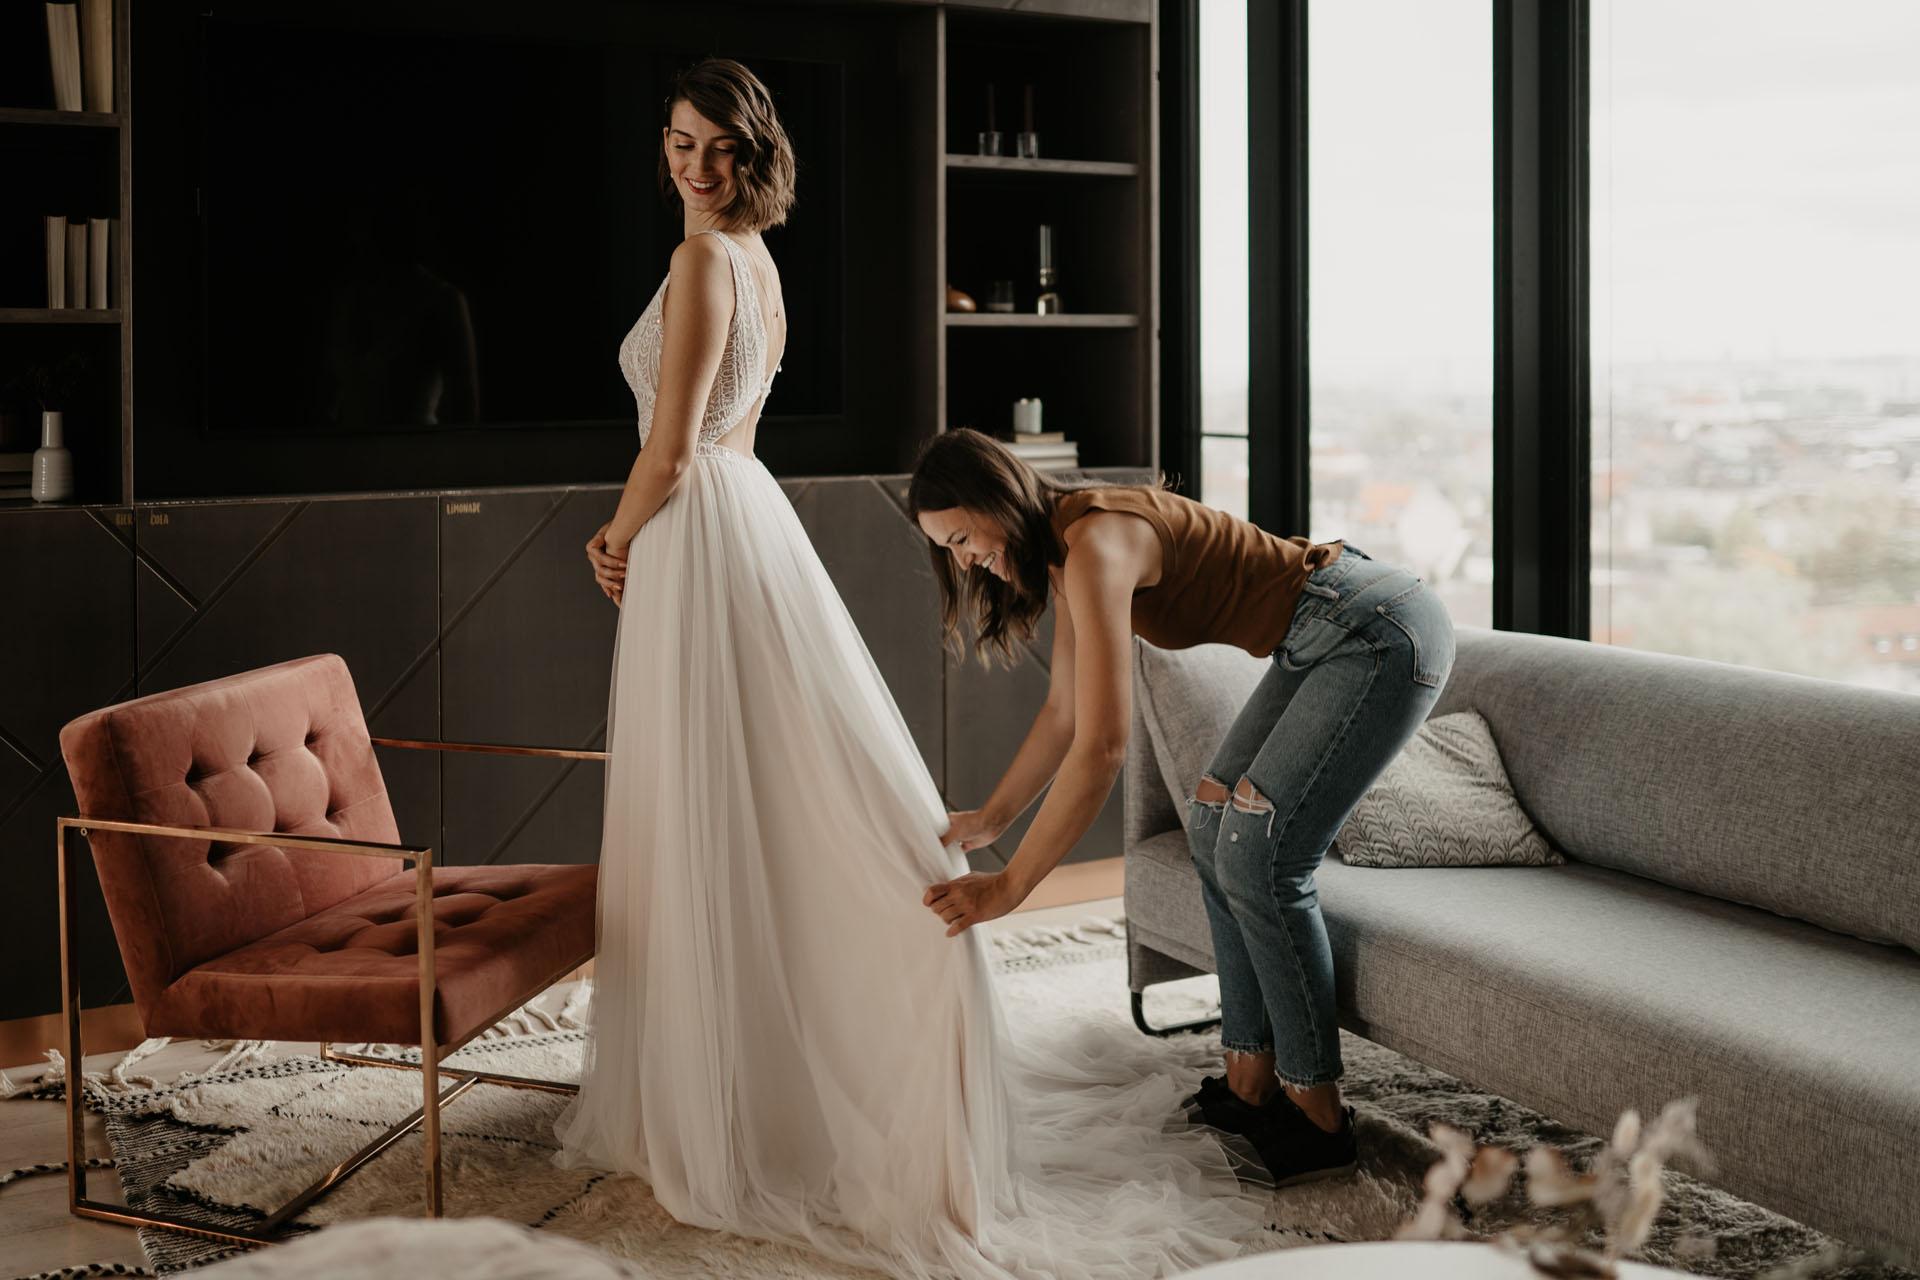 Virtuelle Brautkleidanprobe